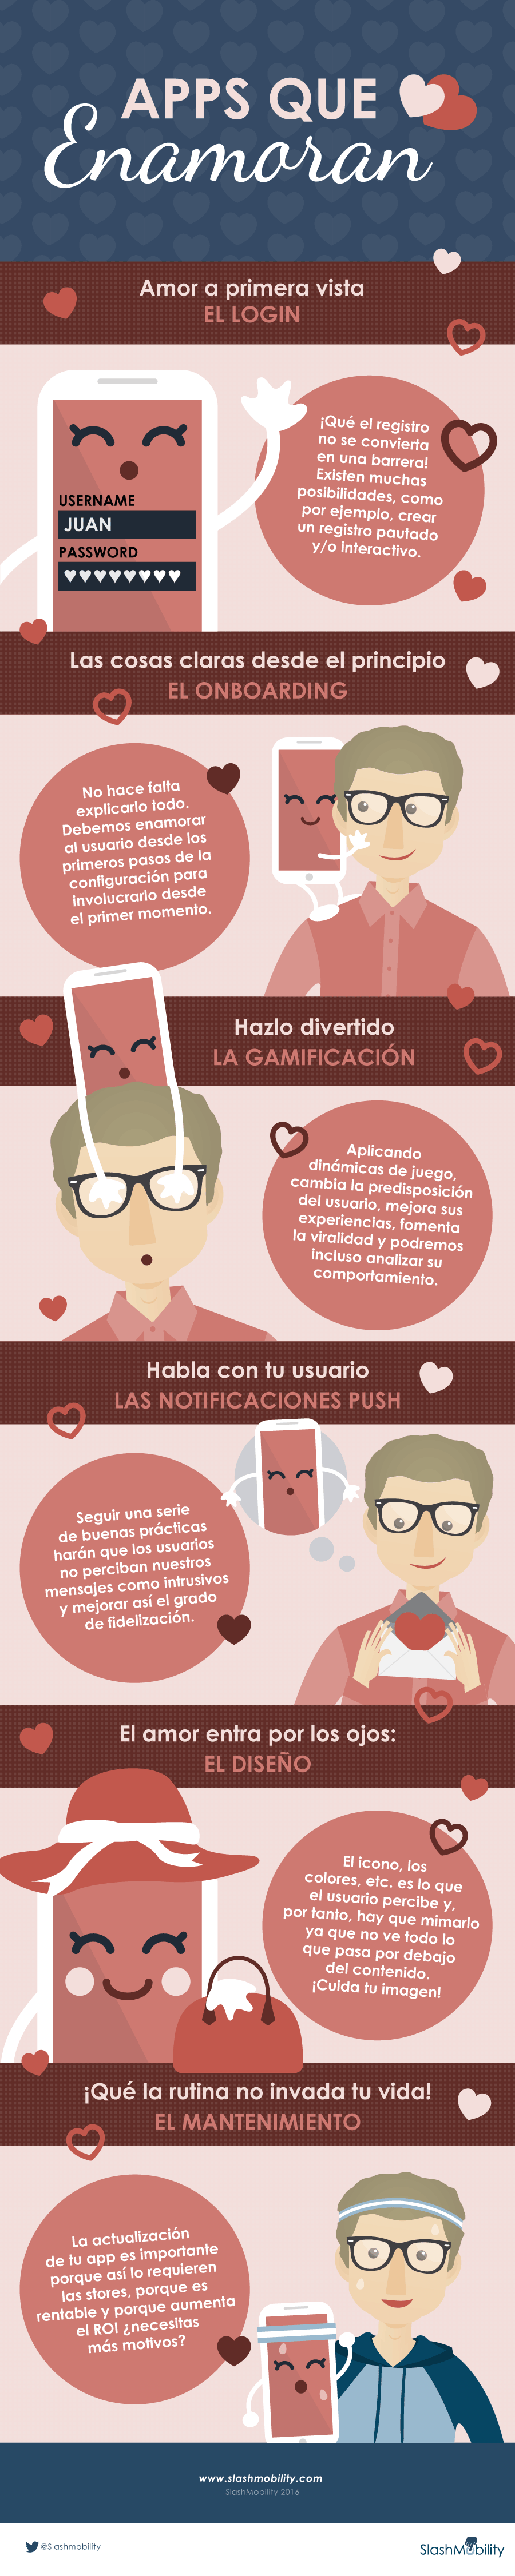 infografia apps que enamoran